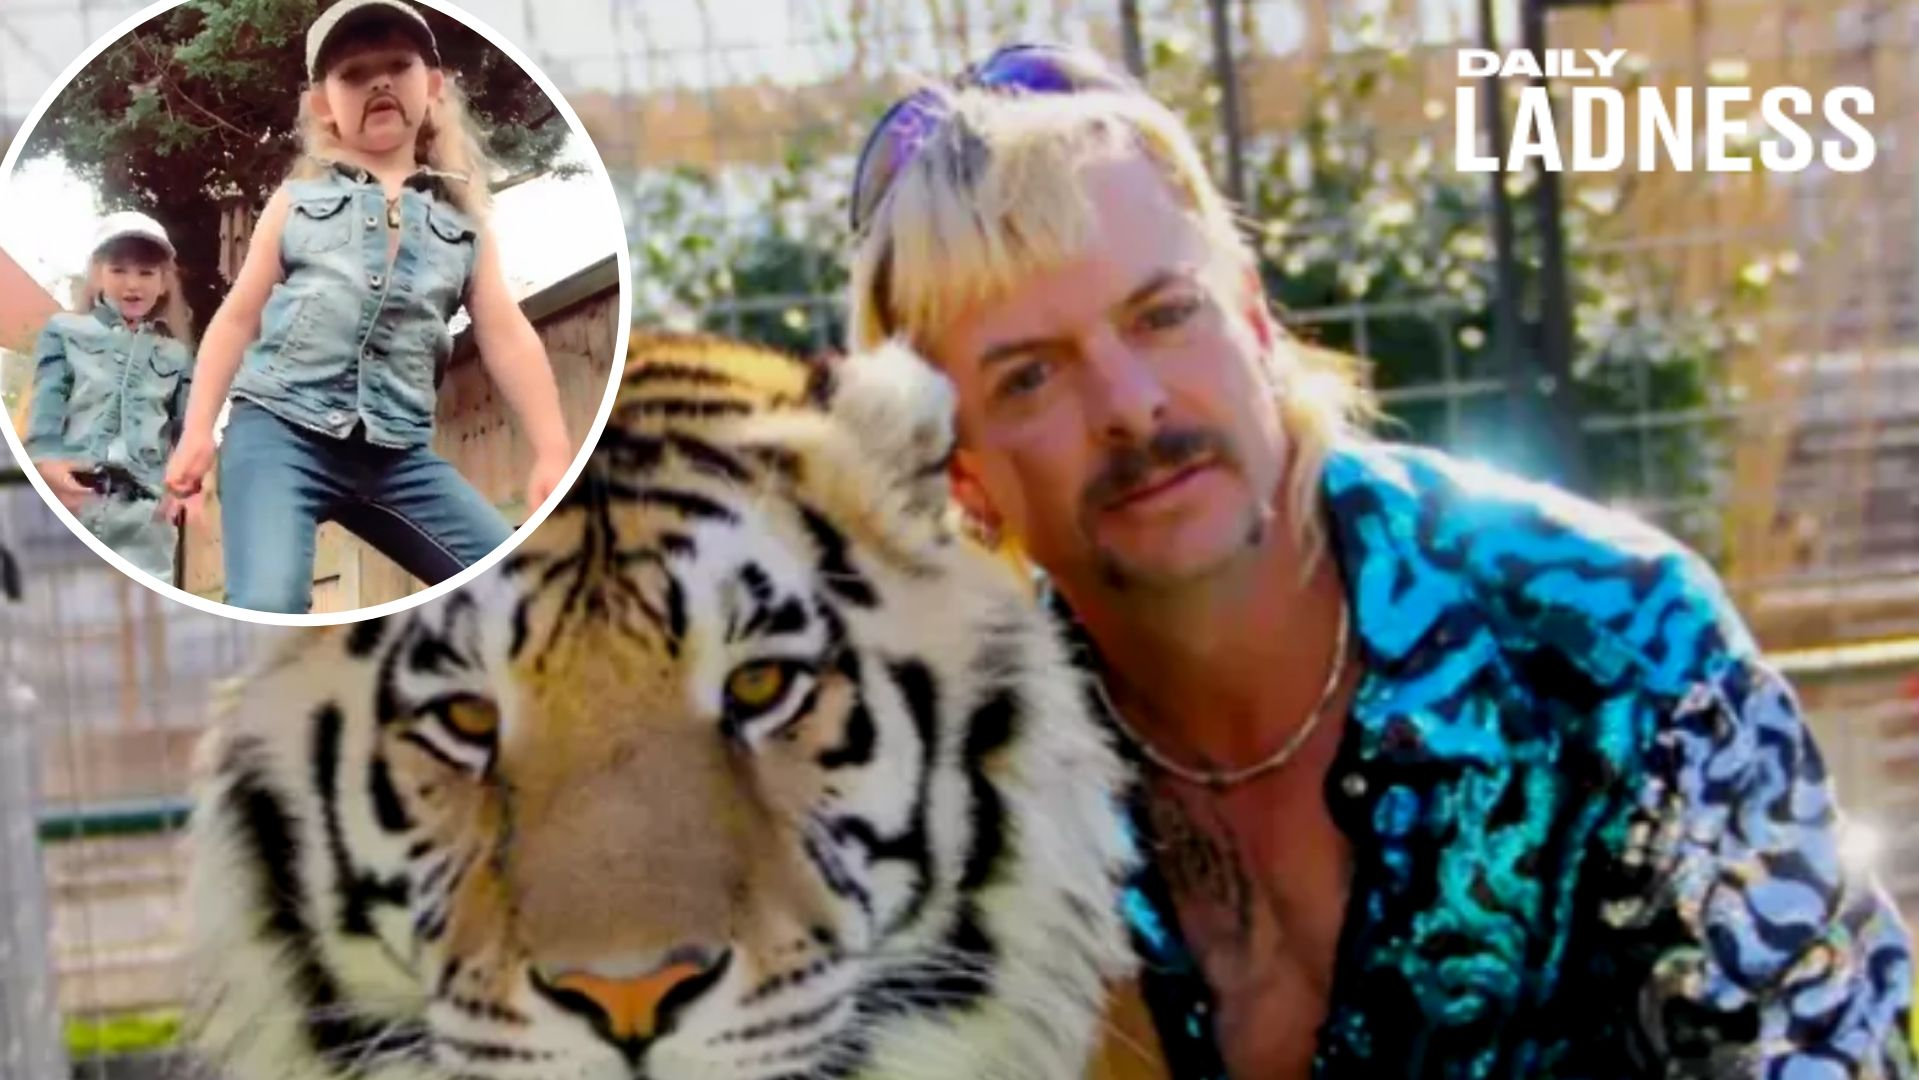 Sisters Aged 6 And 8 Smash Tiktok Tiger King Trend Ladbible